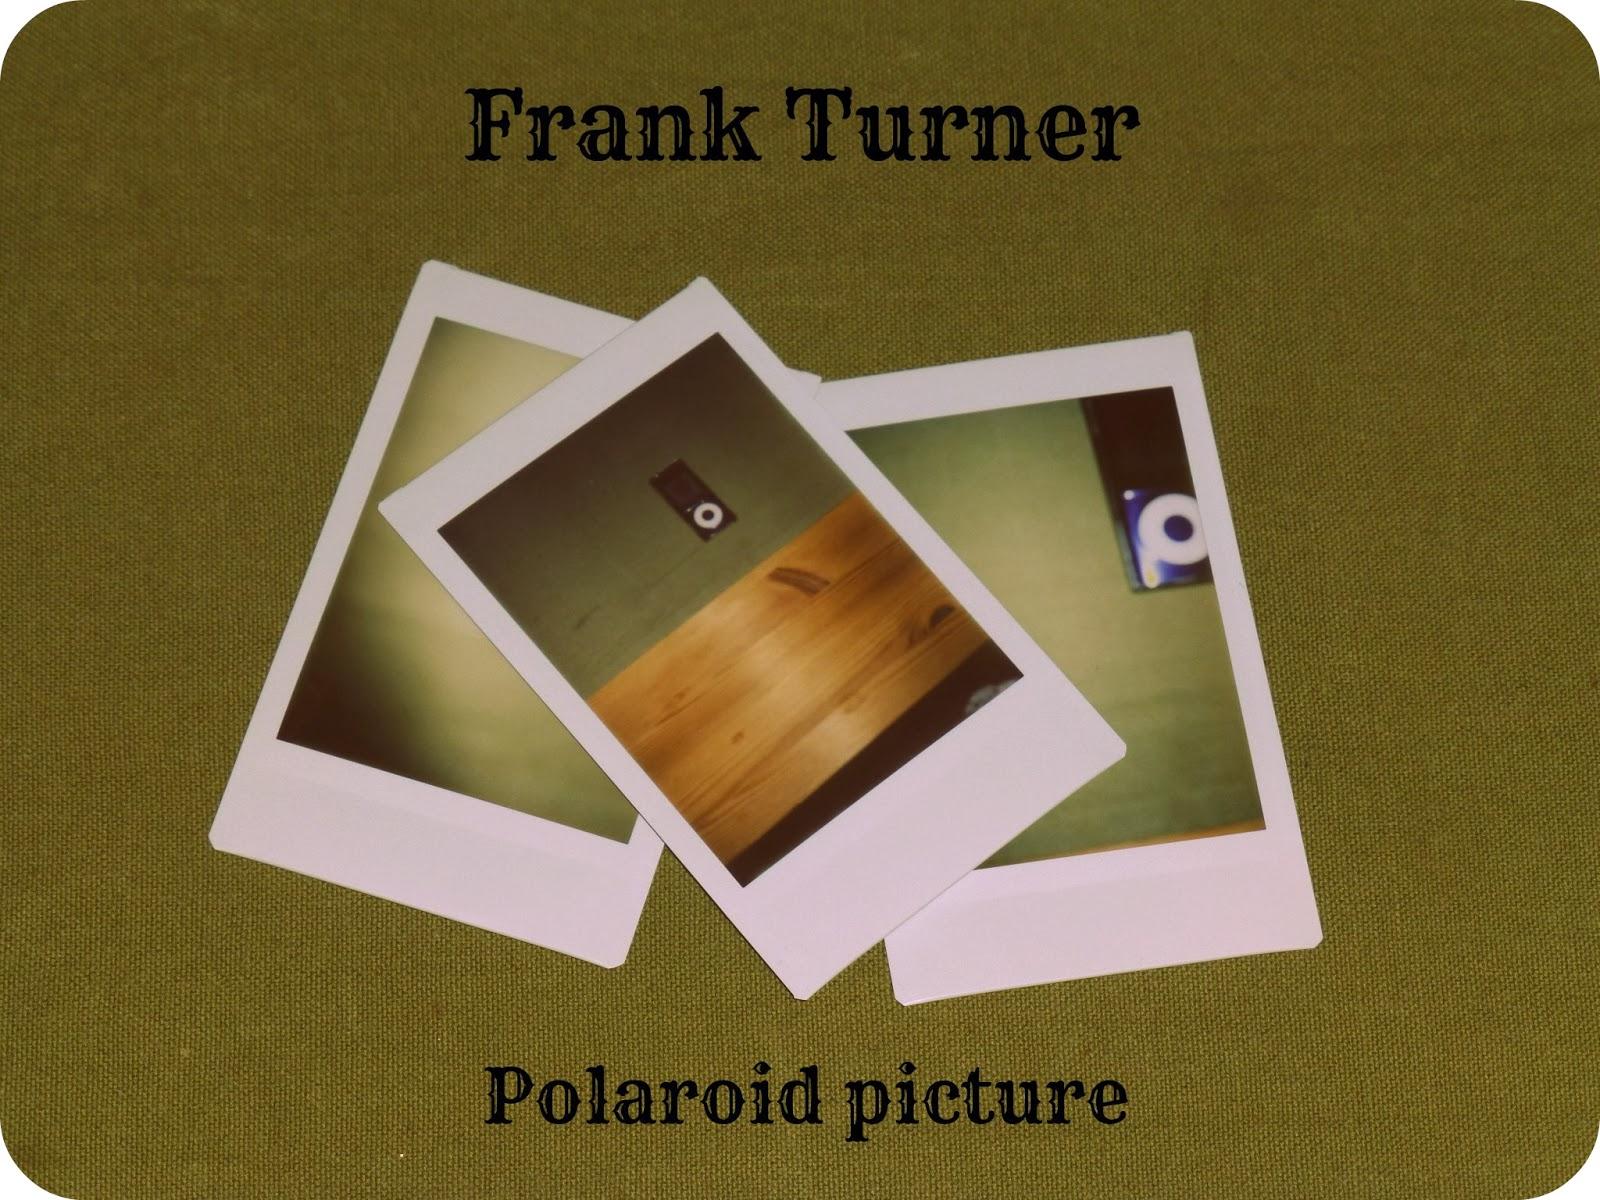 polaroid frank turner covers - HD1600×1200